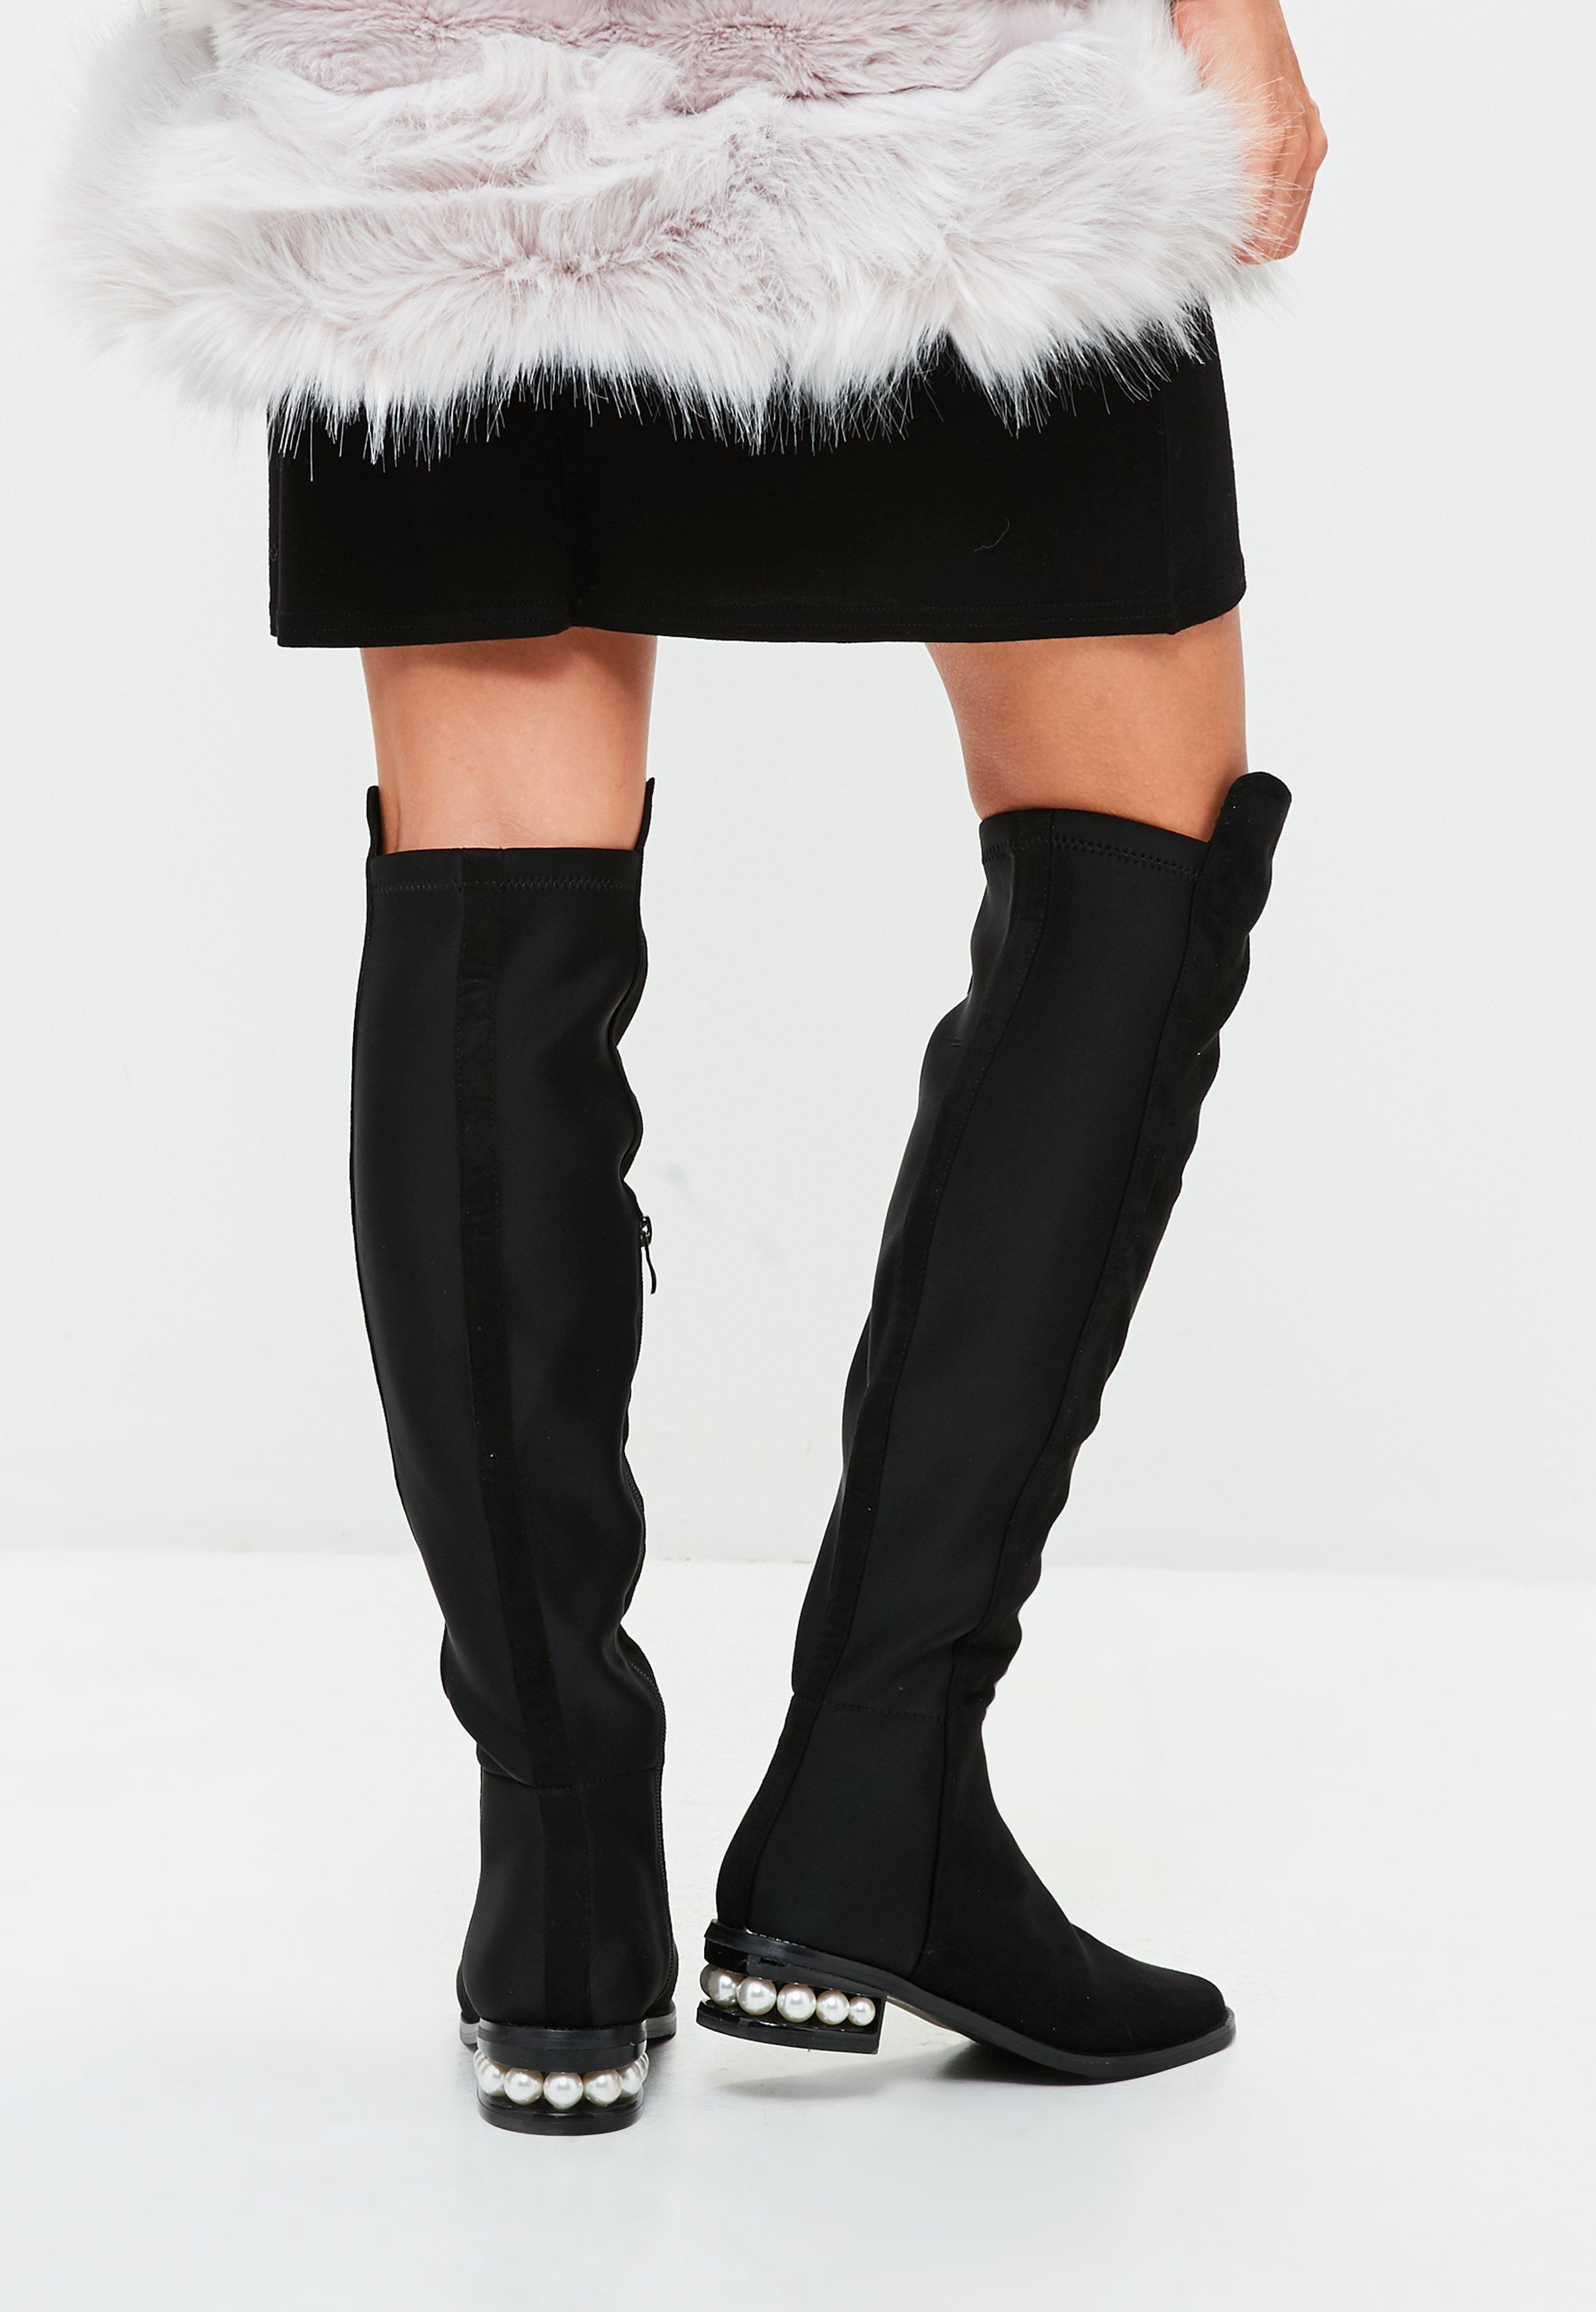 boots femme | boots noires & camel en ligne - missguided